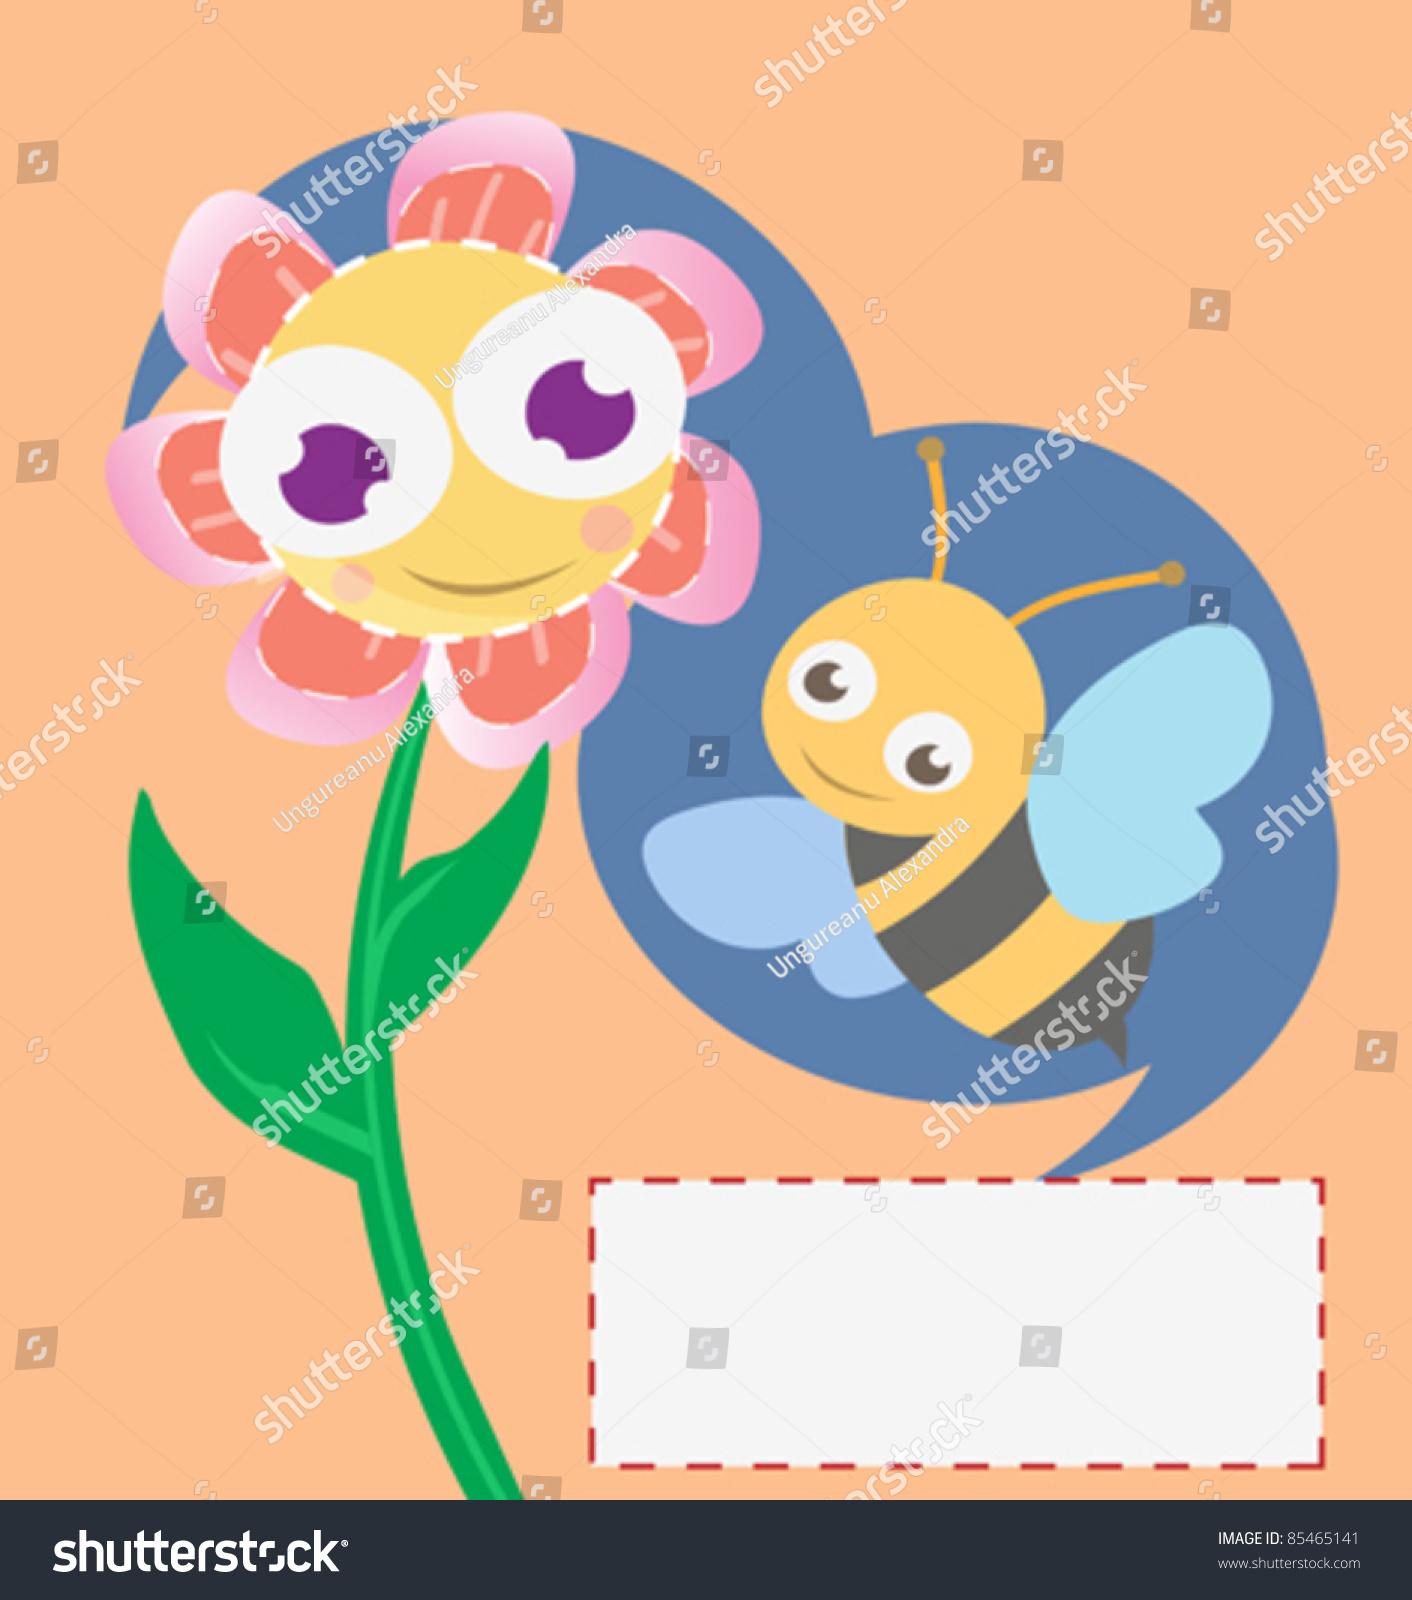 Beautiful cartoon flower gallery flower wallpaper hd beautiful cartoon flower image collections flower wallpaper hd beautiful cartoon flower images flower wallpaper hd beautiful izmirmasajfo